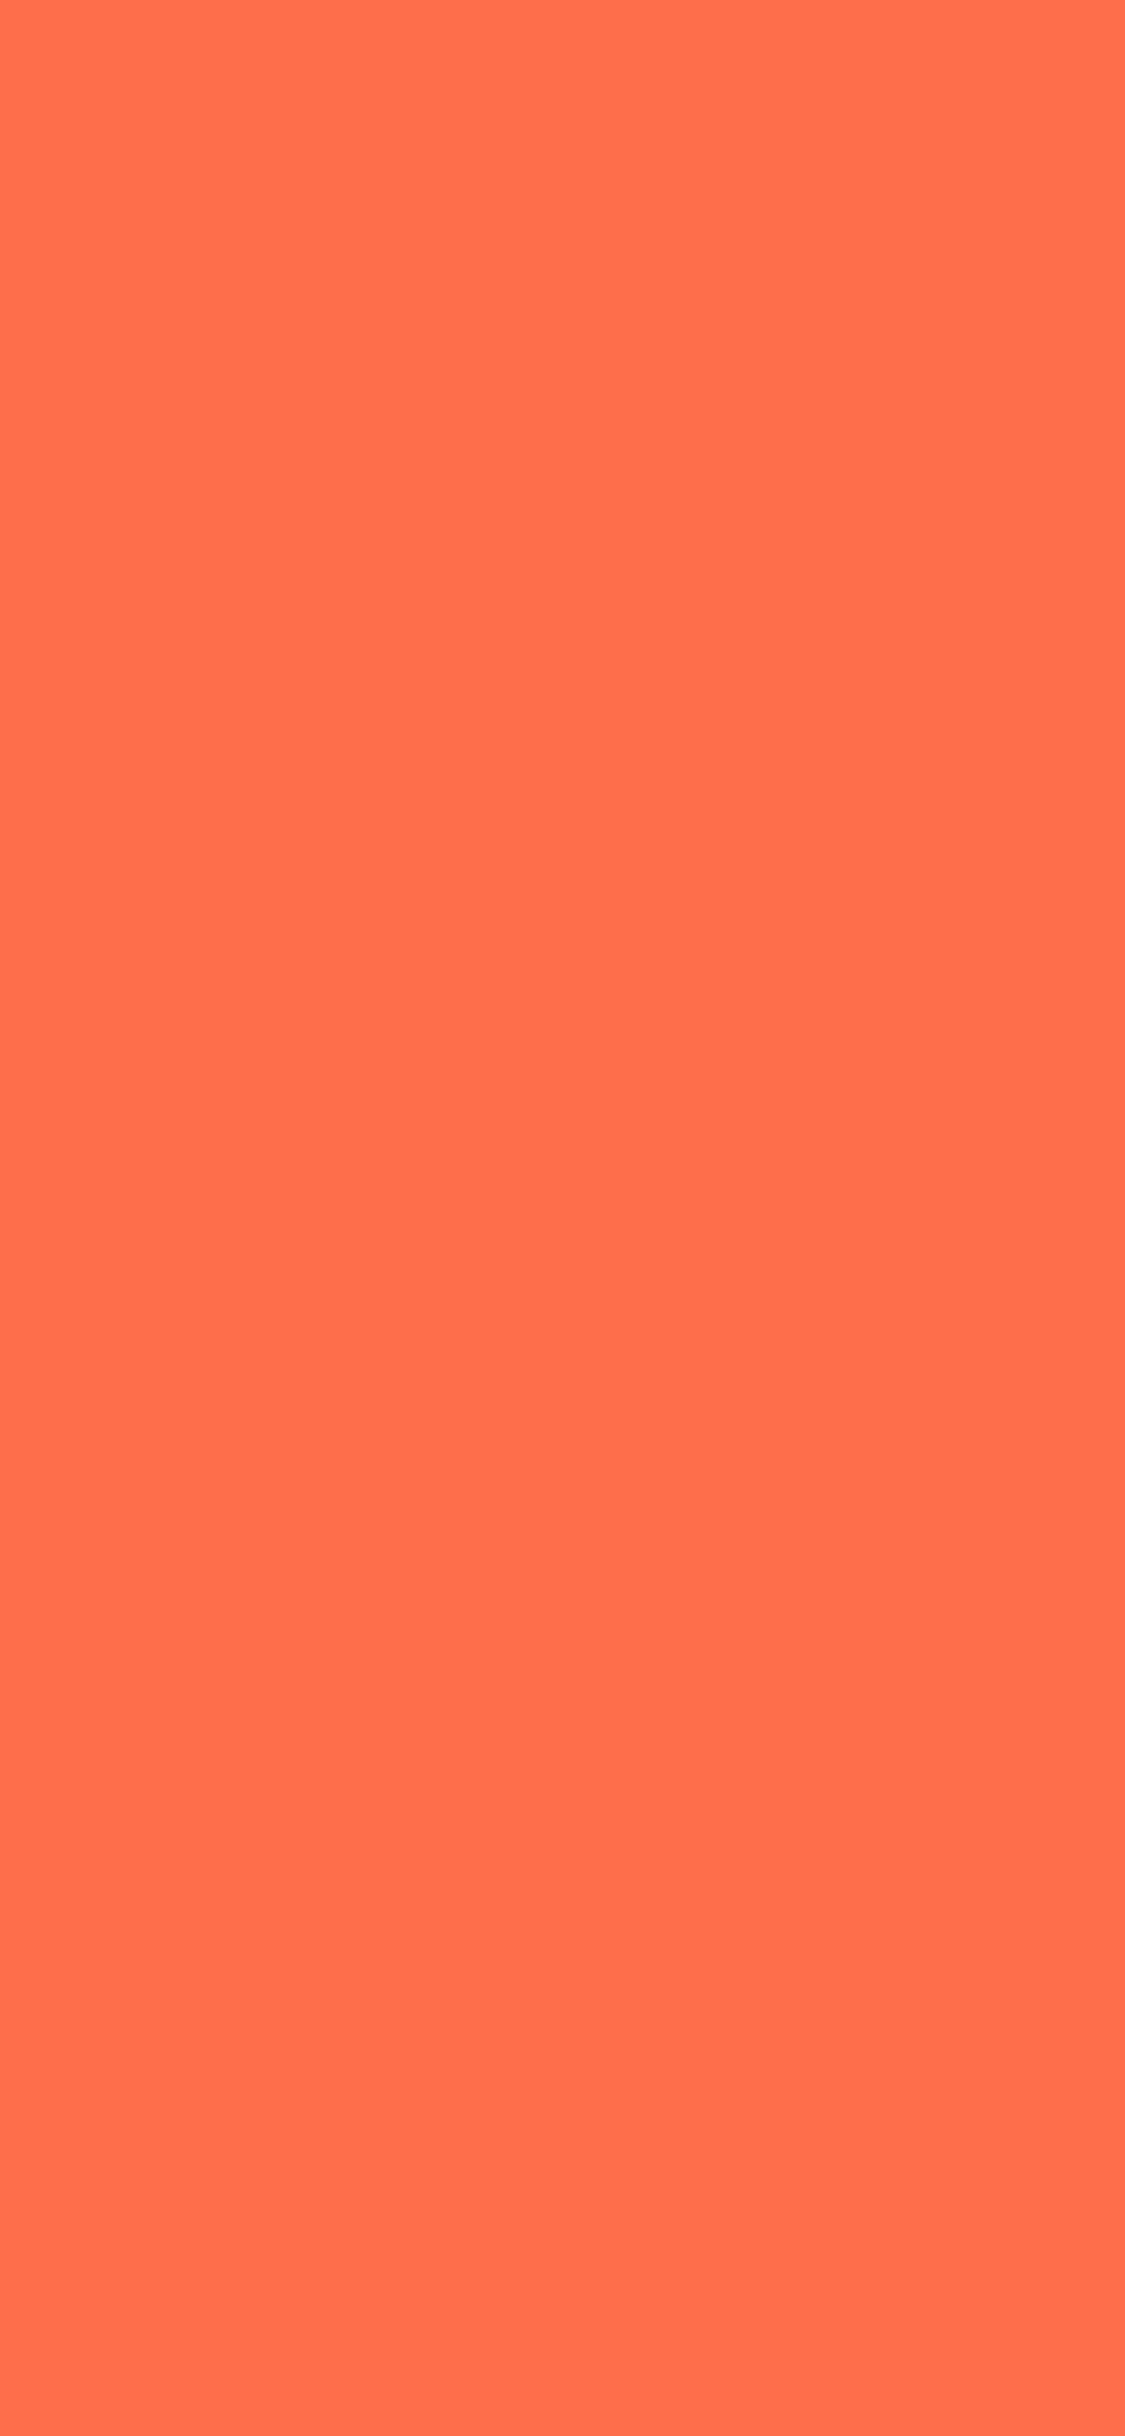 1125x2436 Outrageous Orange Solid Color Background